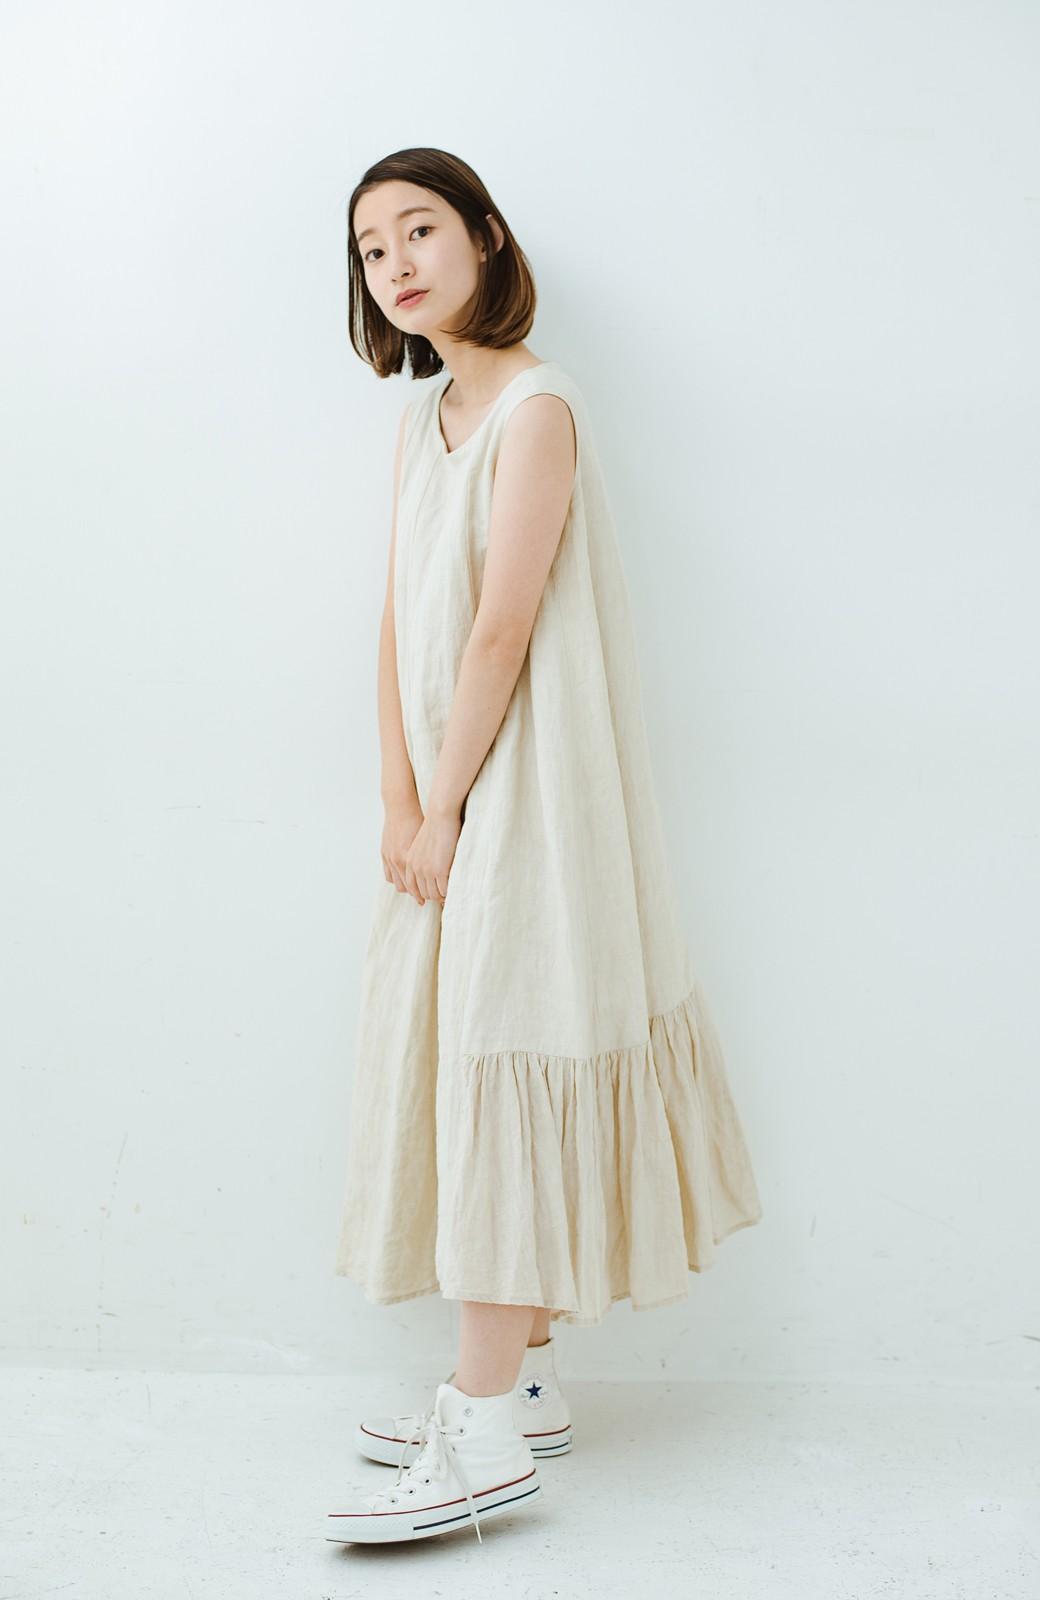 haco! てとひとて Miho Umezawa TWILL LINEN アシンメトリードレス <ライトベージュ>の商品写真14